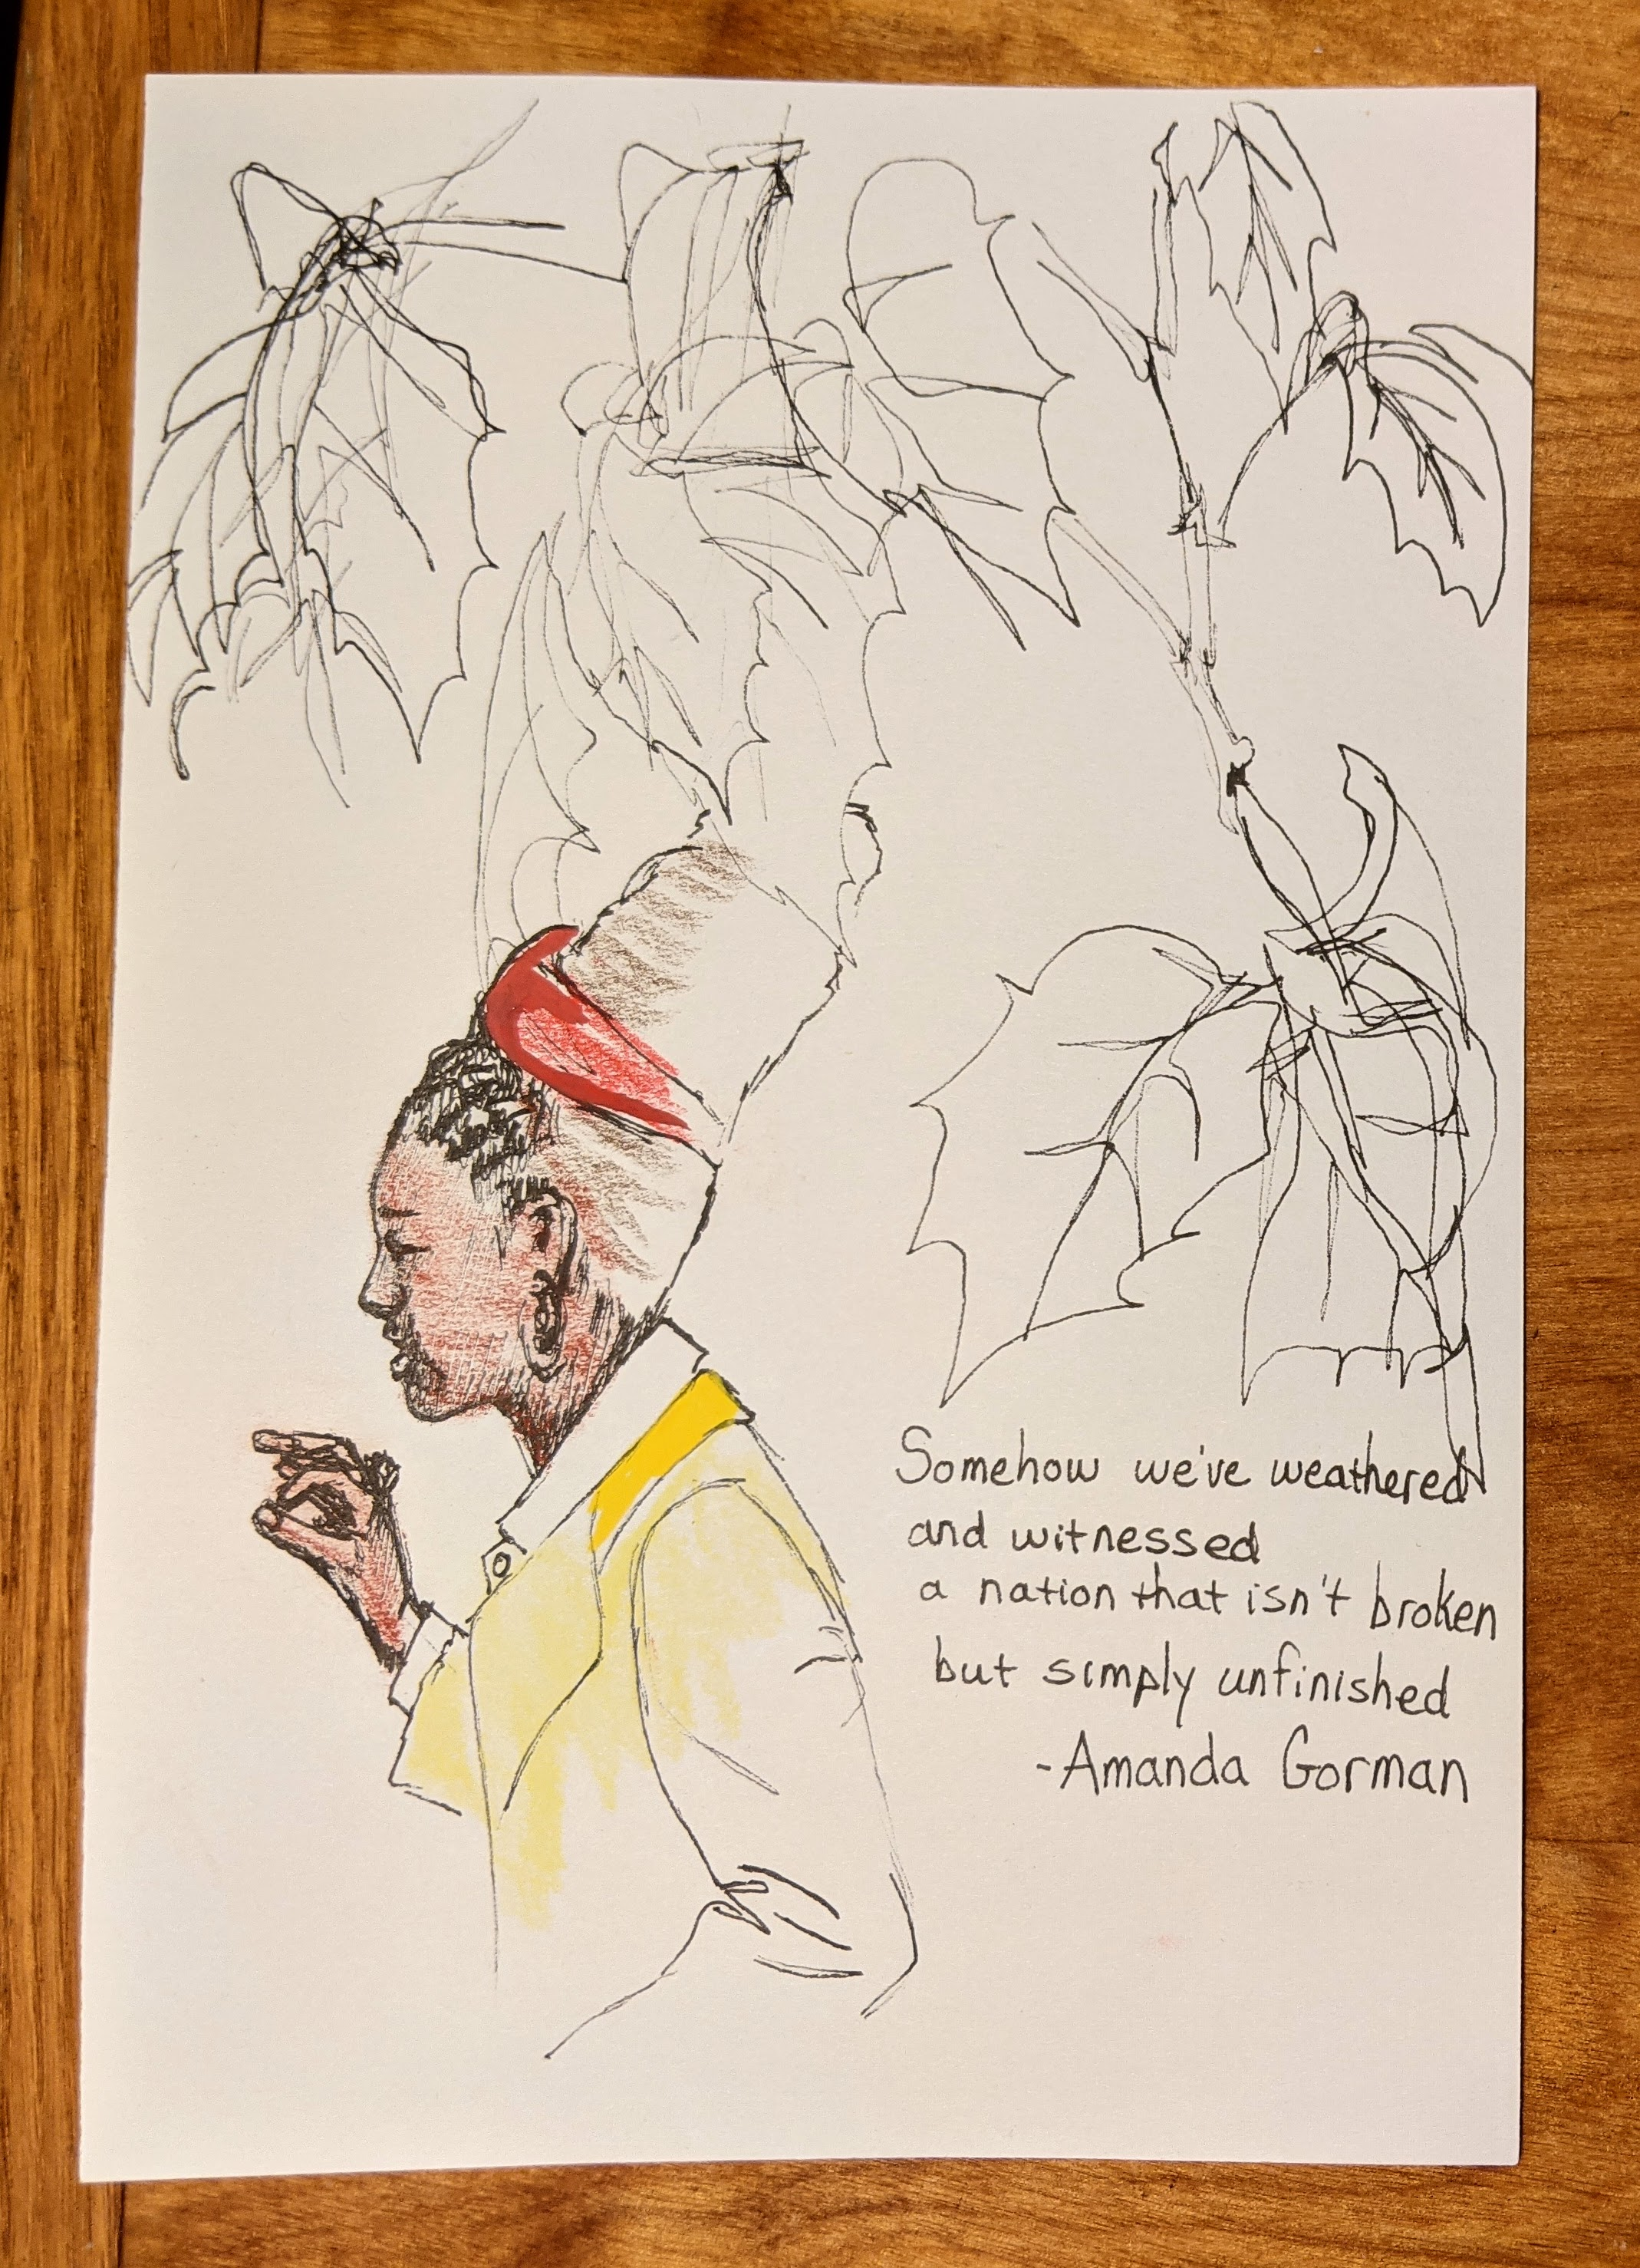 sketch of leaves and Amanda Gorman the inauguration poet.